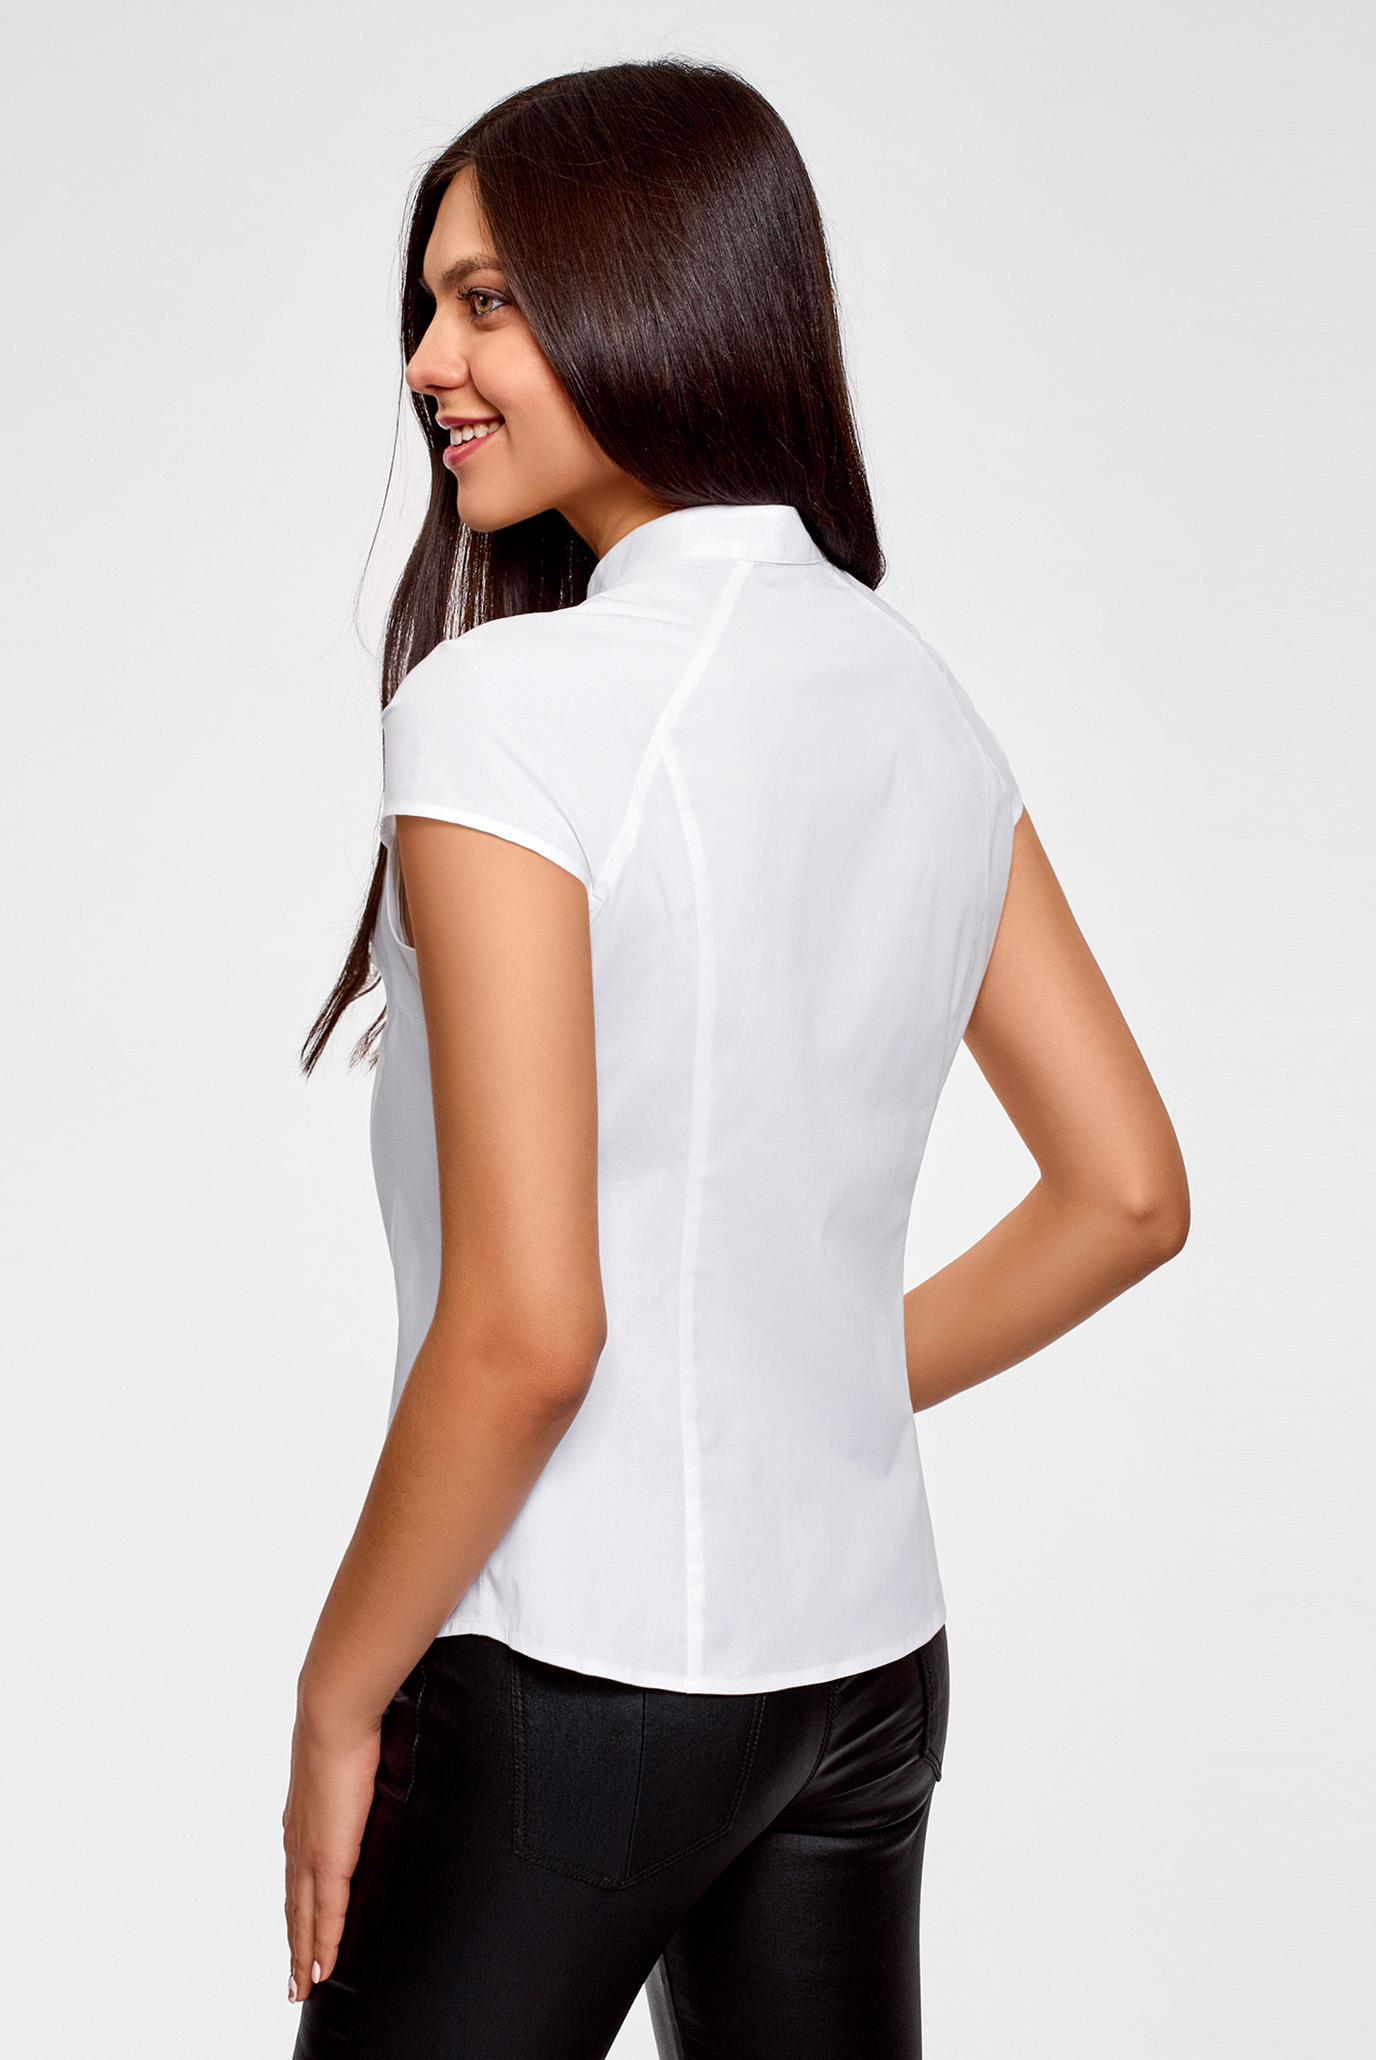 7bc8dab076d69ef Купить Женская белая рубашка Oodji Oodji 13K03006B/26357/1000N – Киев,  Украина. Цены в интернет магазине MD Fashion